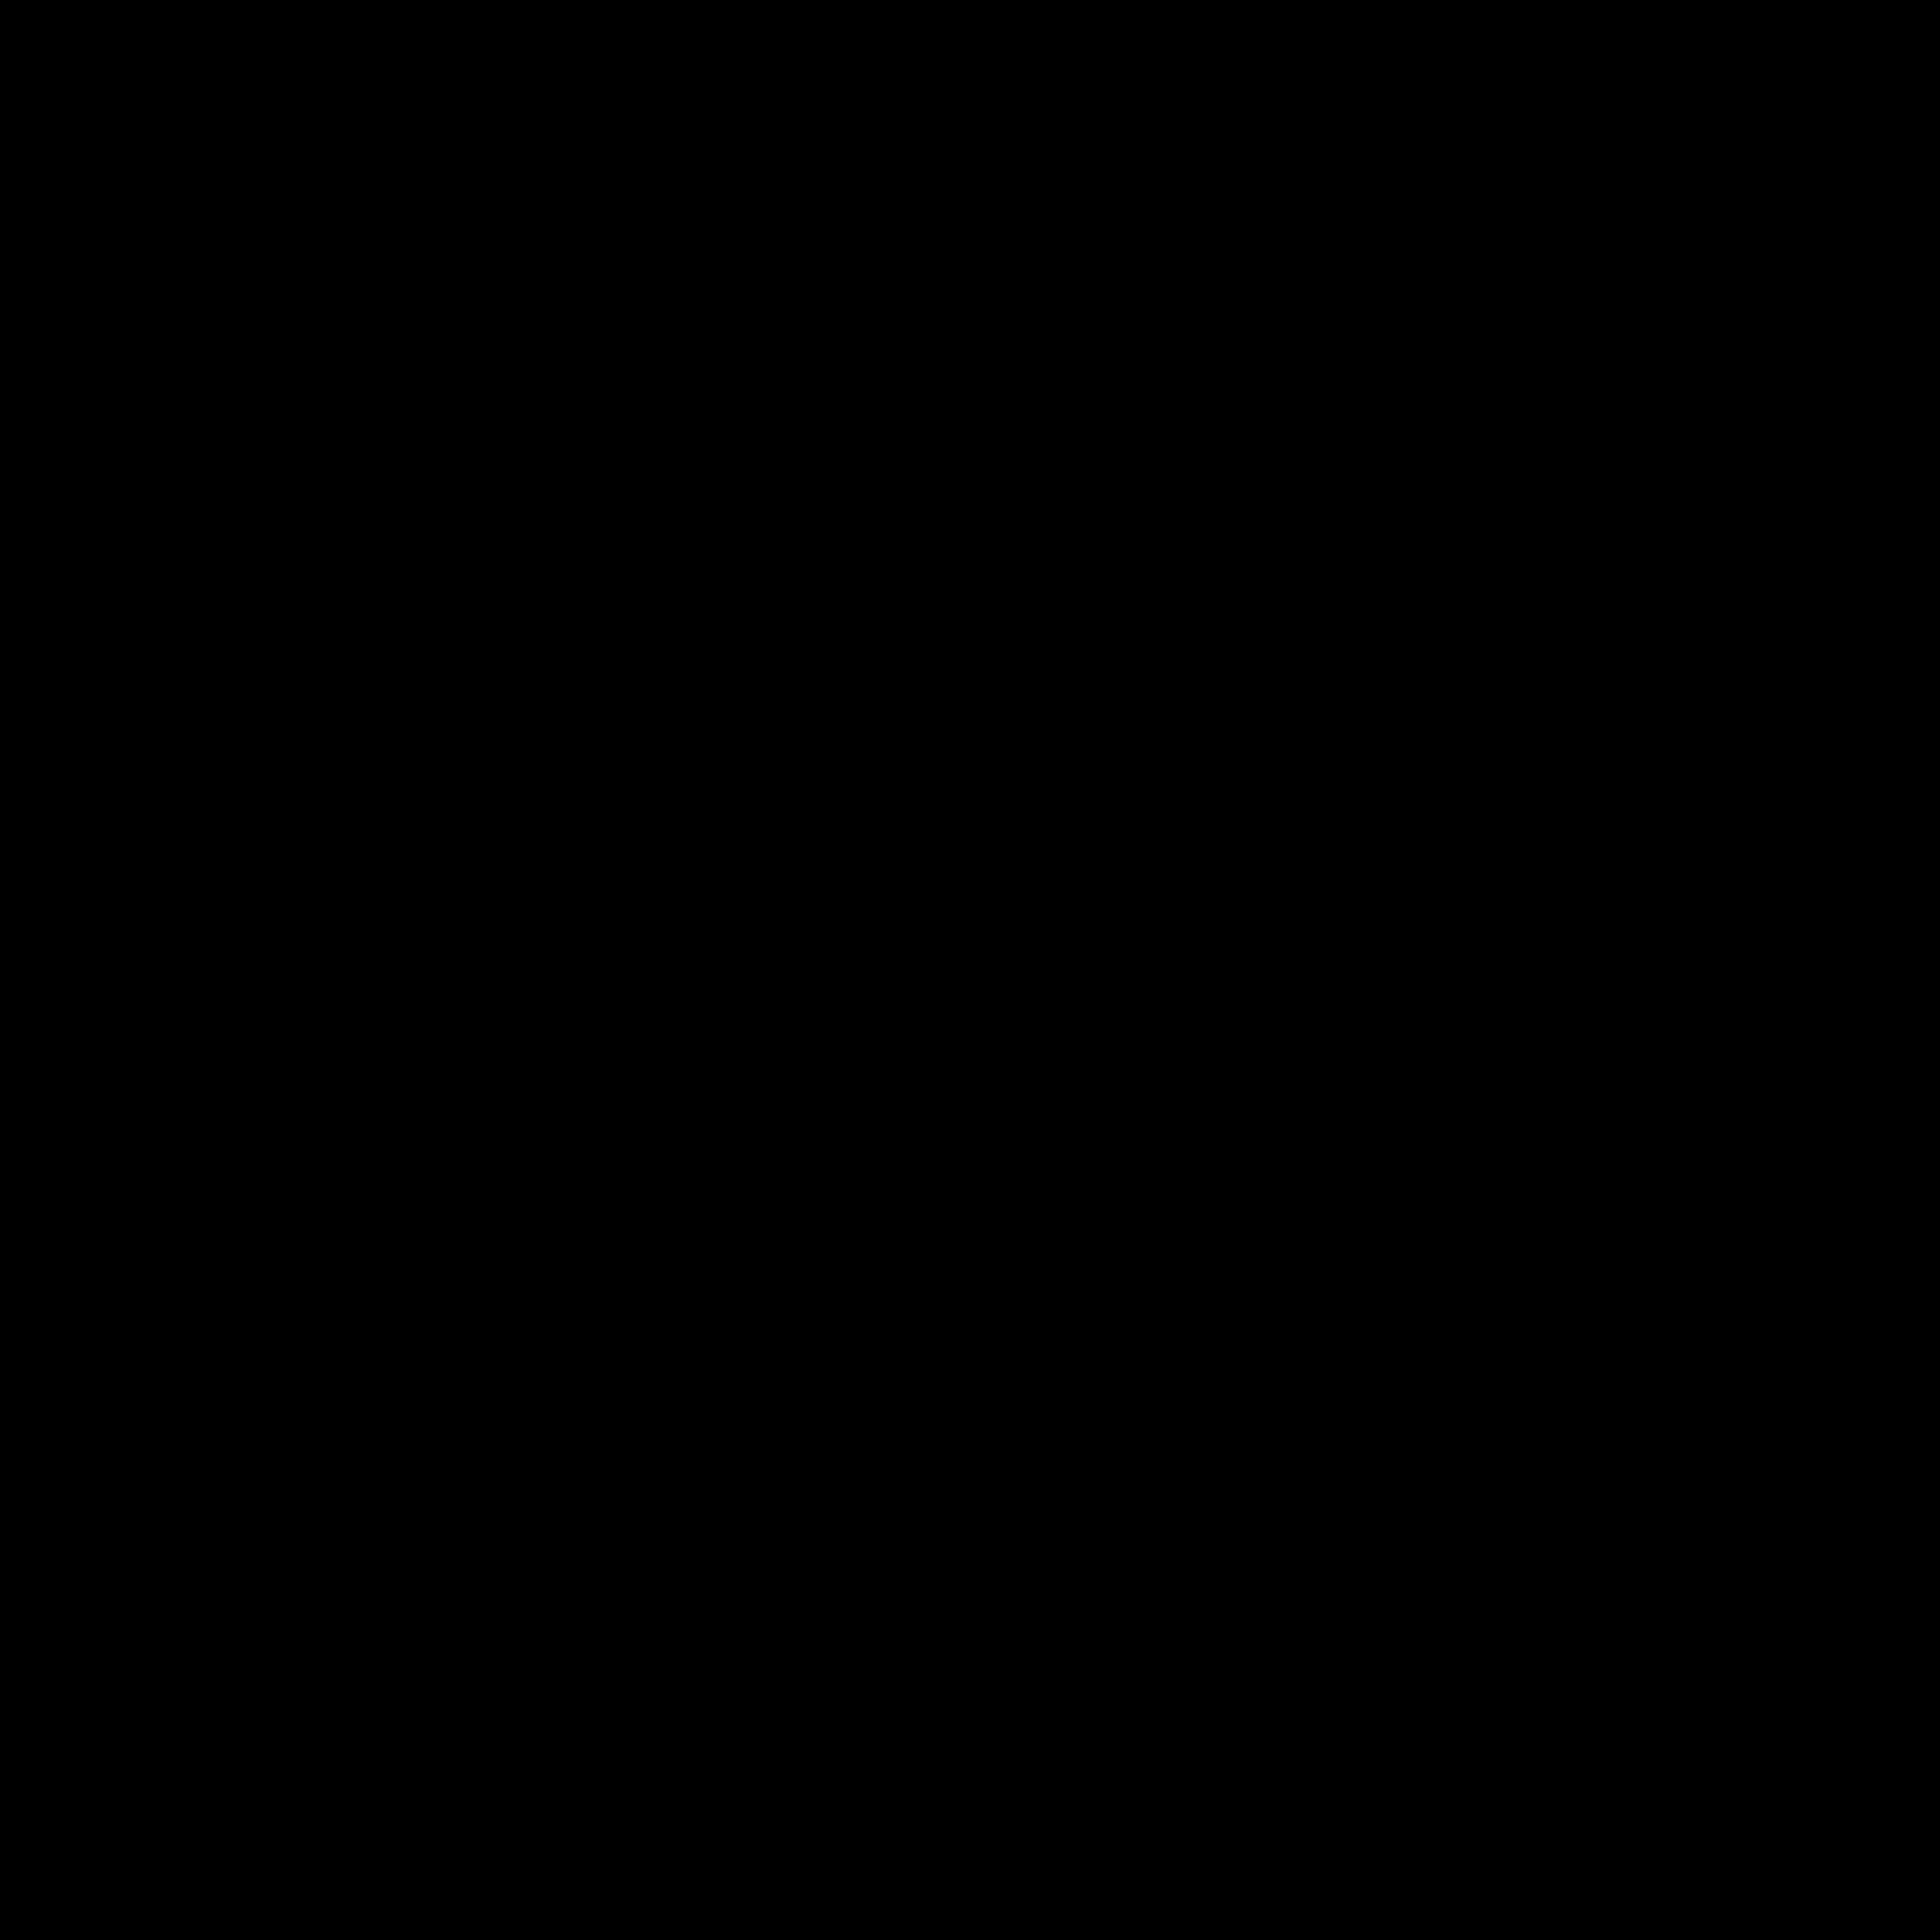 2000x2000 Filesimpleicons Places Sailboat Black Silhouette.svg